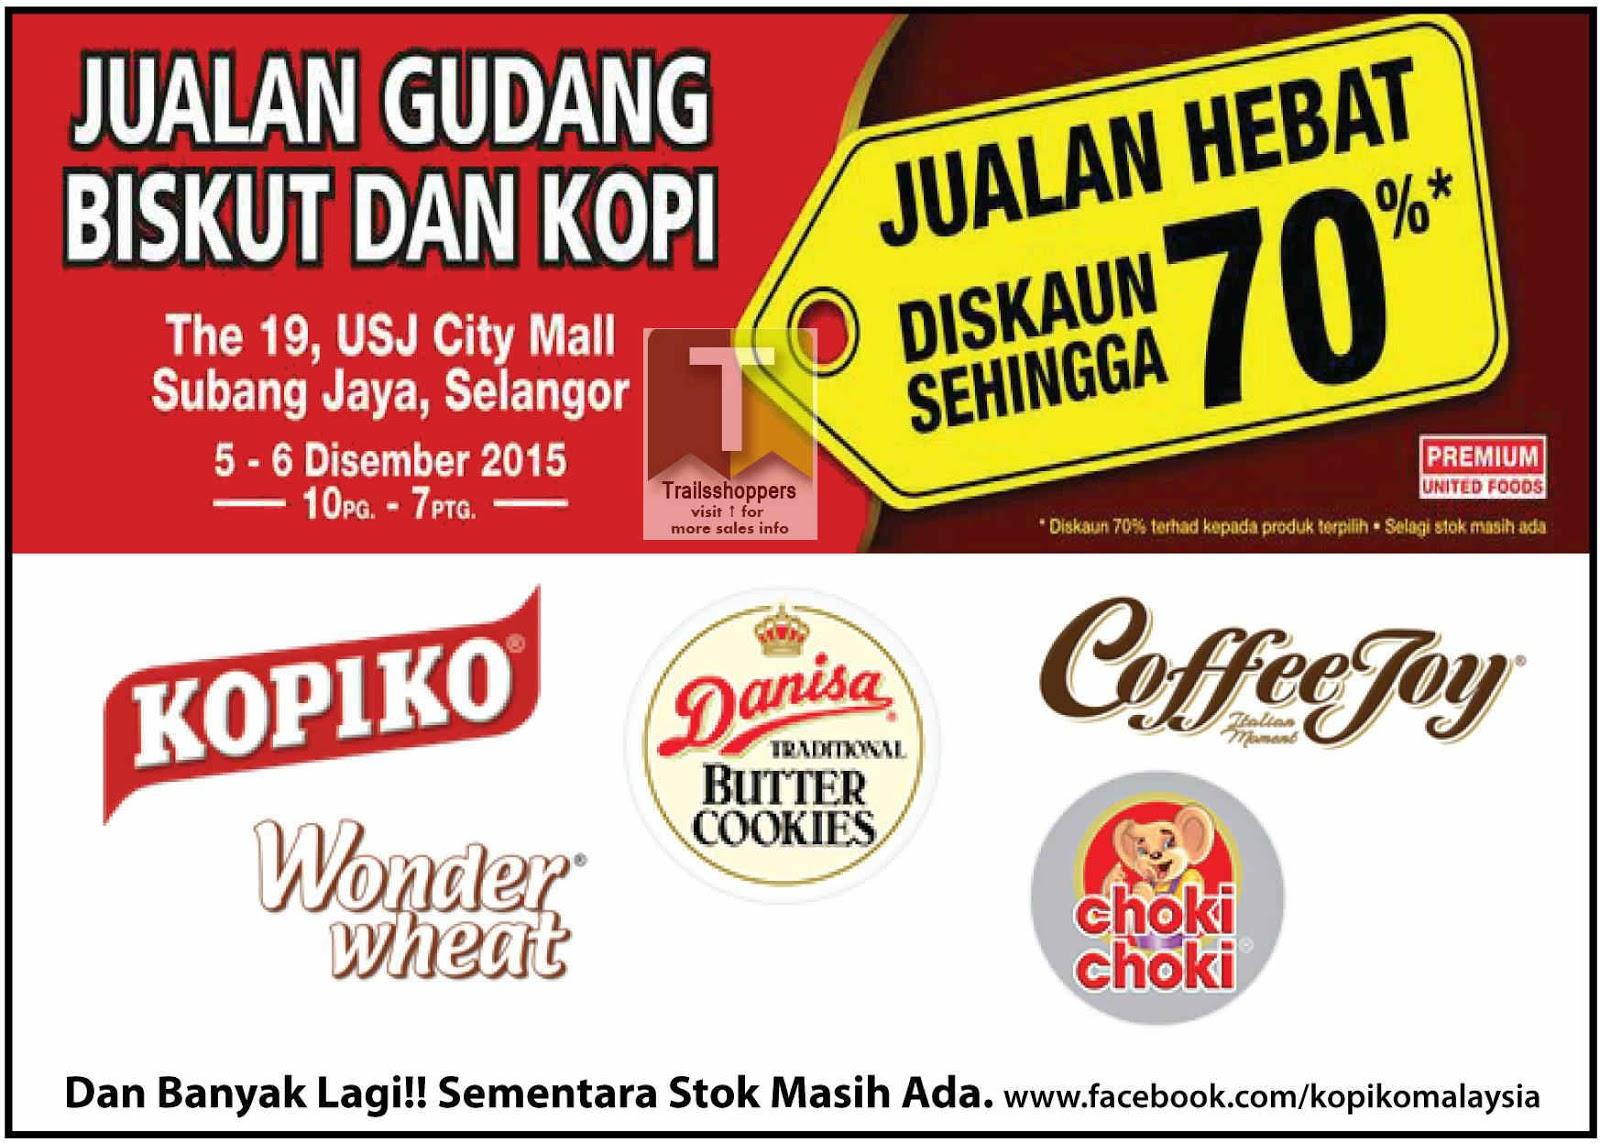 Biscuit & Coffee Warehouse Sale 2015 kopiko danisa cookies malaysia